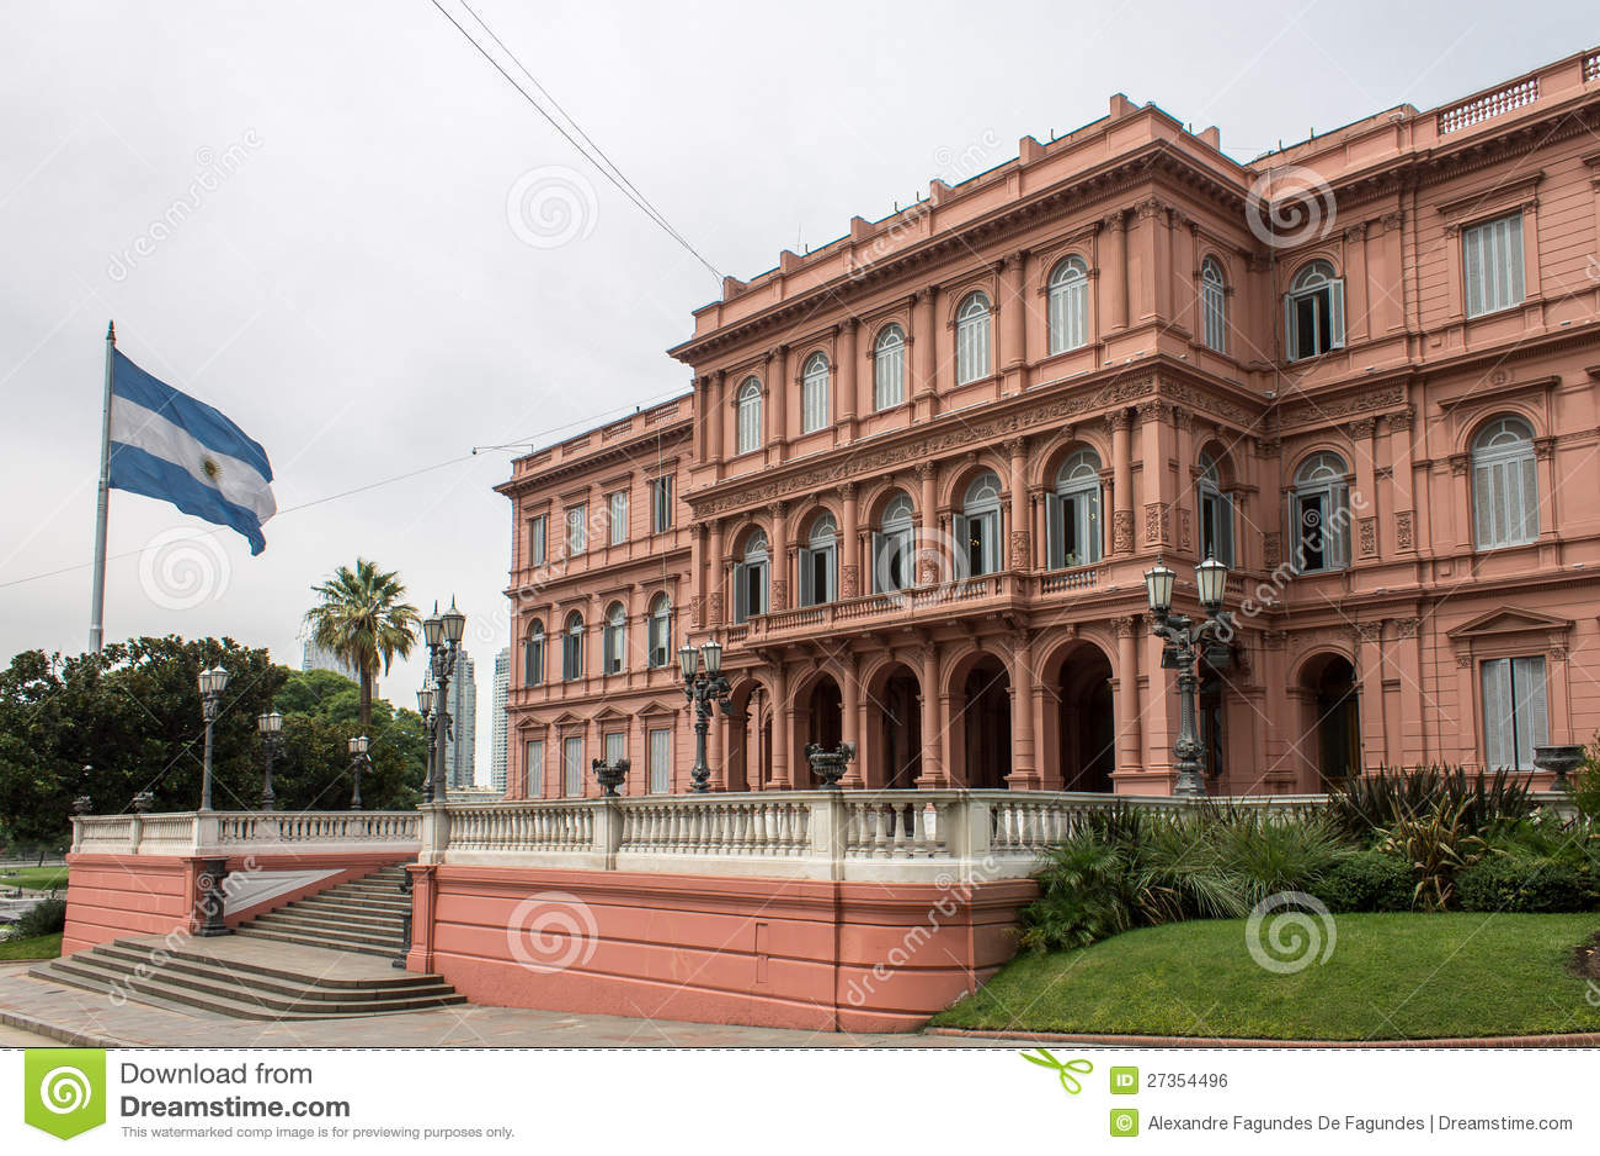 Casa rosada side facade argentina royalty free stock image for Casa argentina